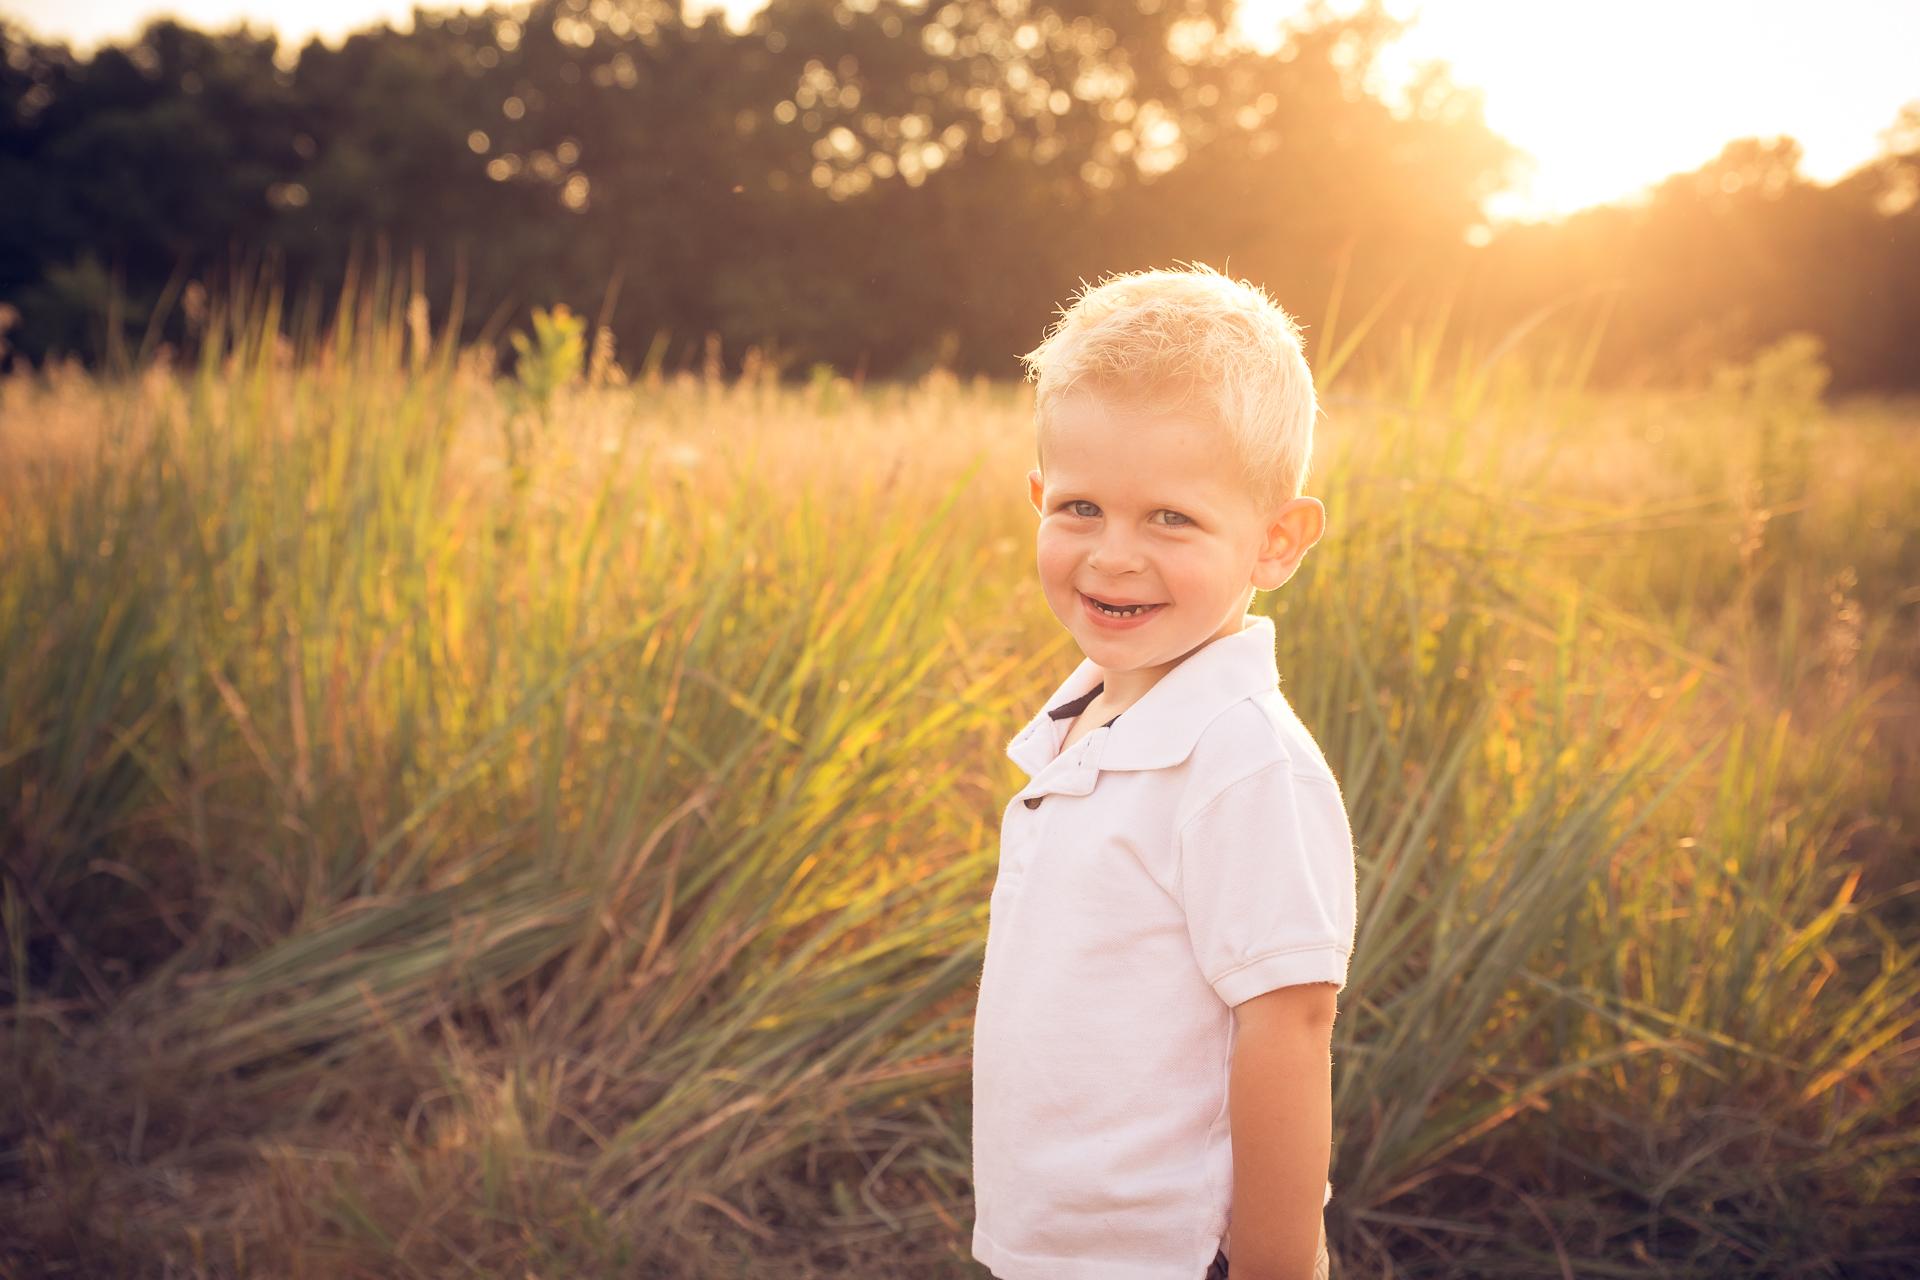 child-photographers-urbandale-3.jpg